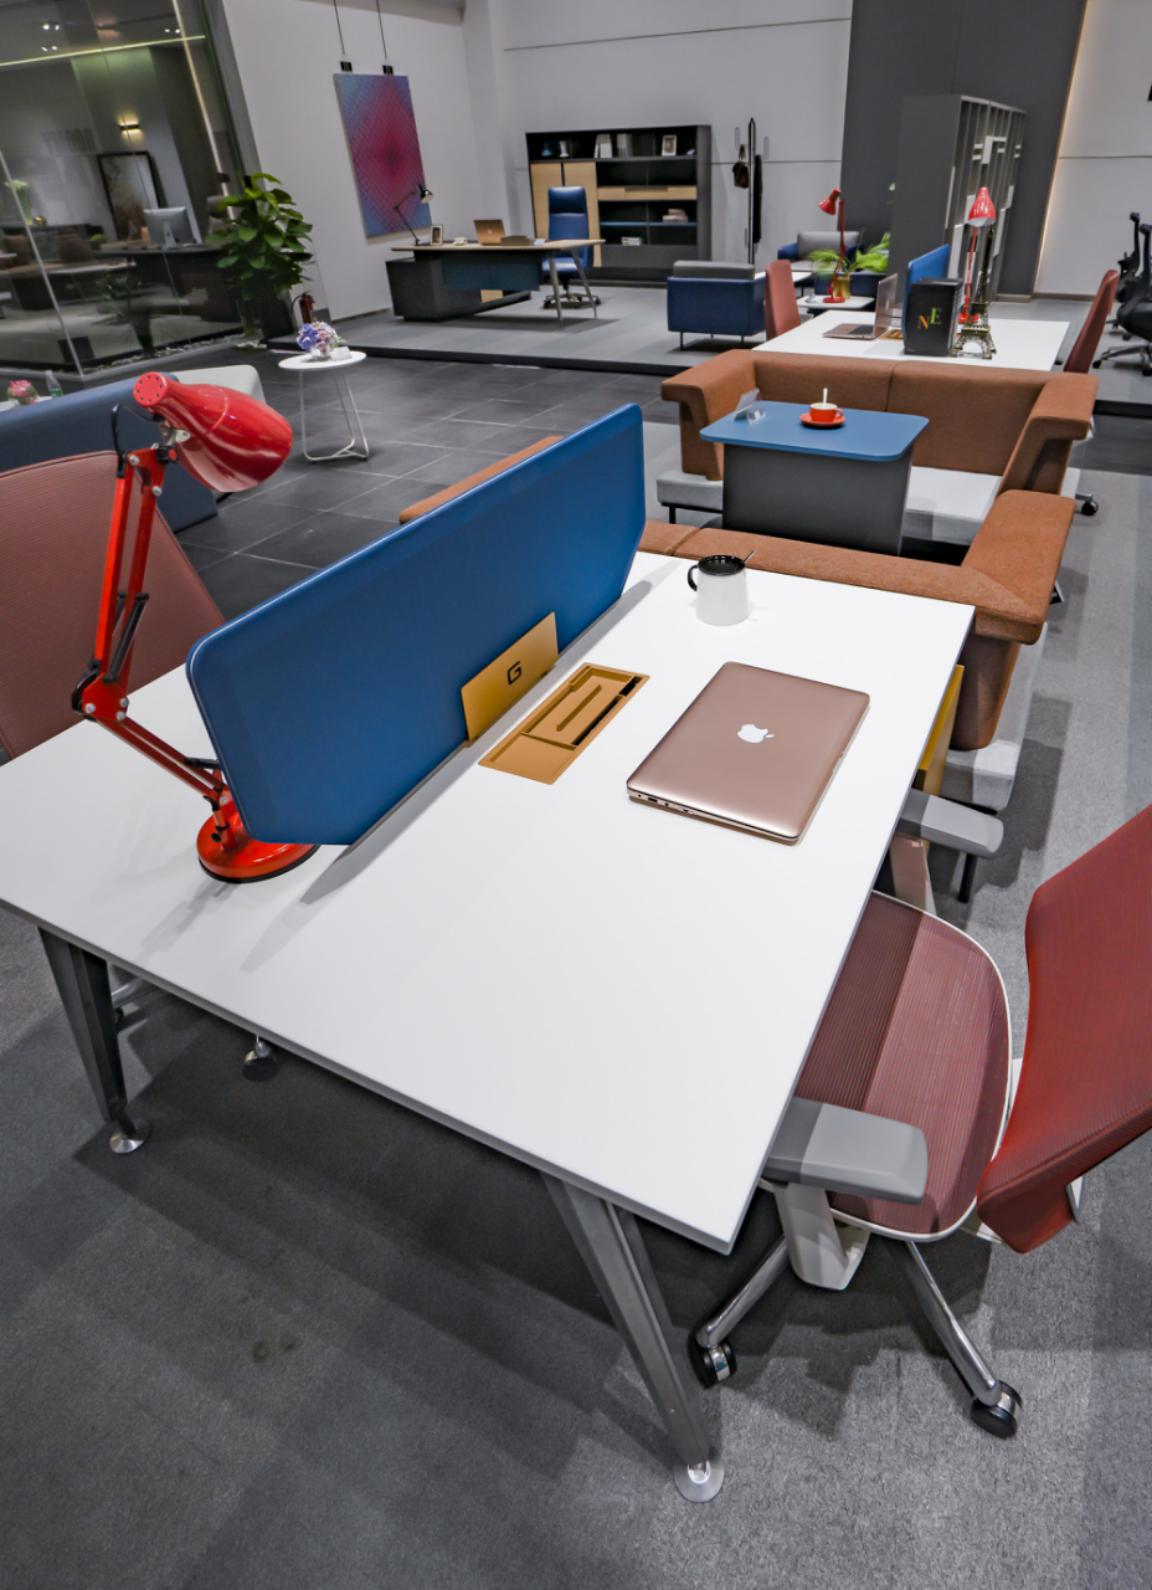 news-GOJO-Hot-sale Modern Stylish Office Furniture Collection-img-2